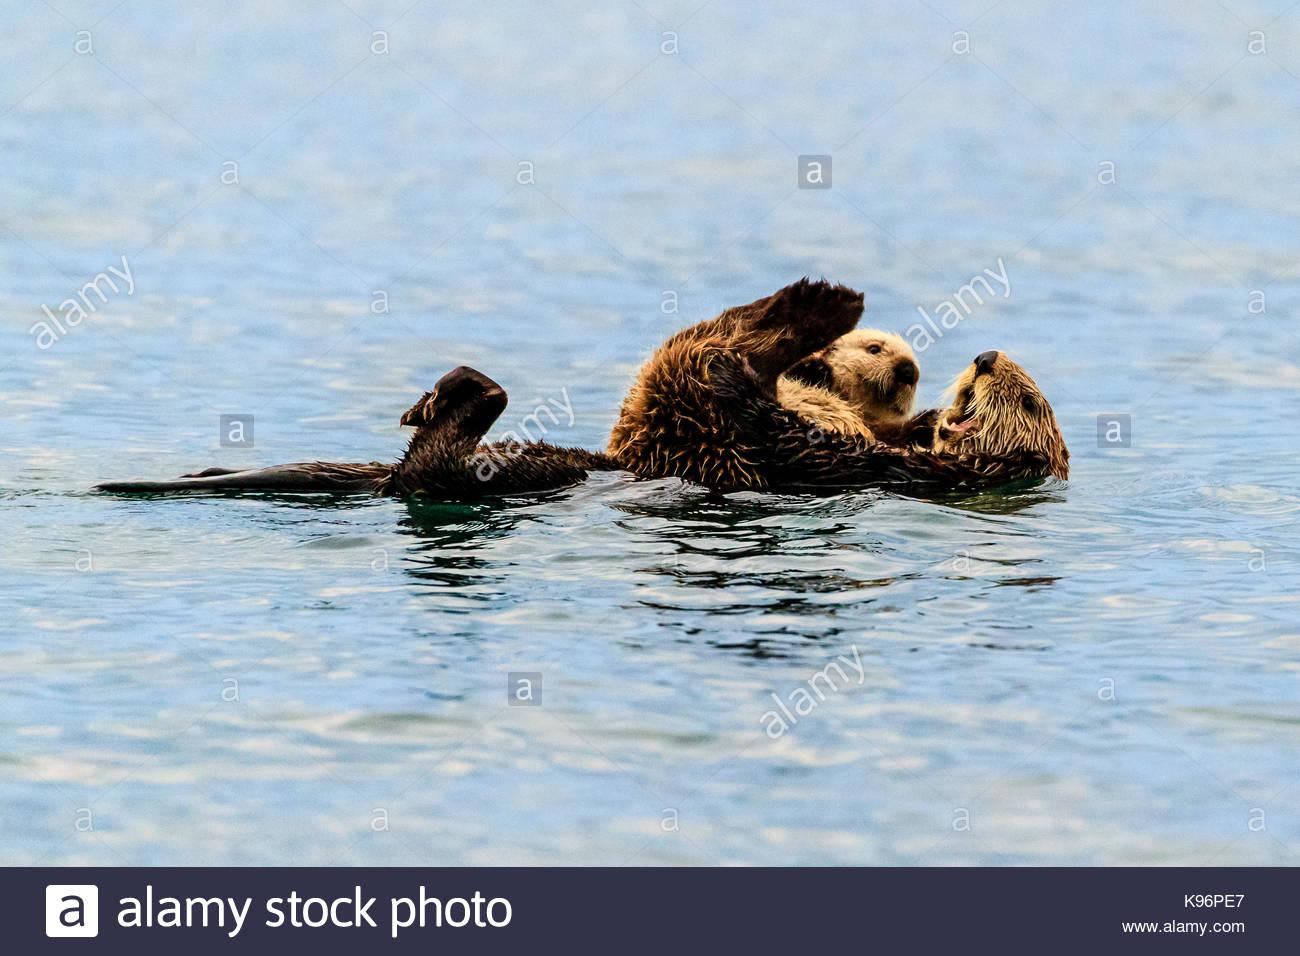 Sea Otter, Enhydra lutris, madre e pup in Kachemak Bay. Immagini Stock